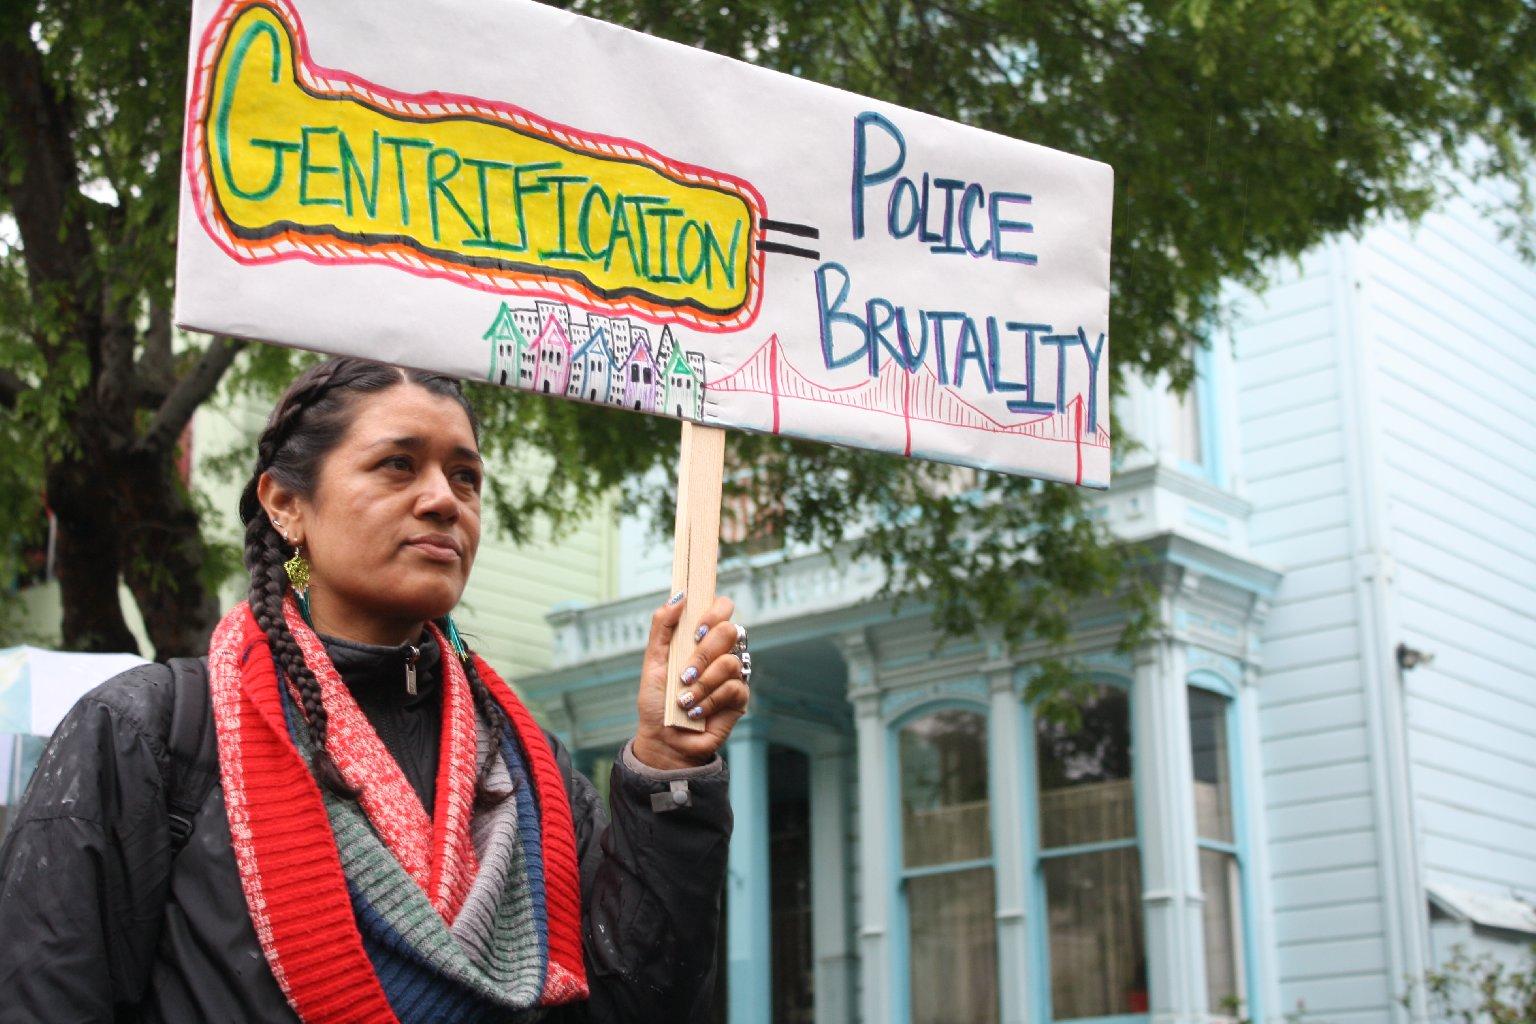 San Francisco native   Catherine Marroquin, Image Source:Alex Emslie/KQED